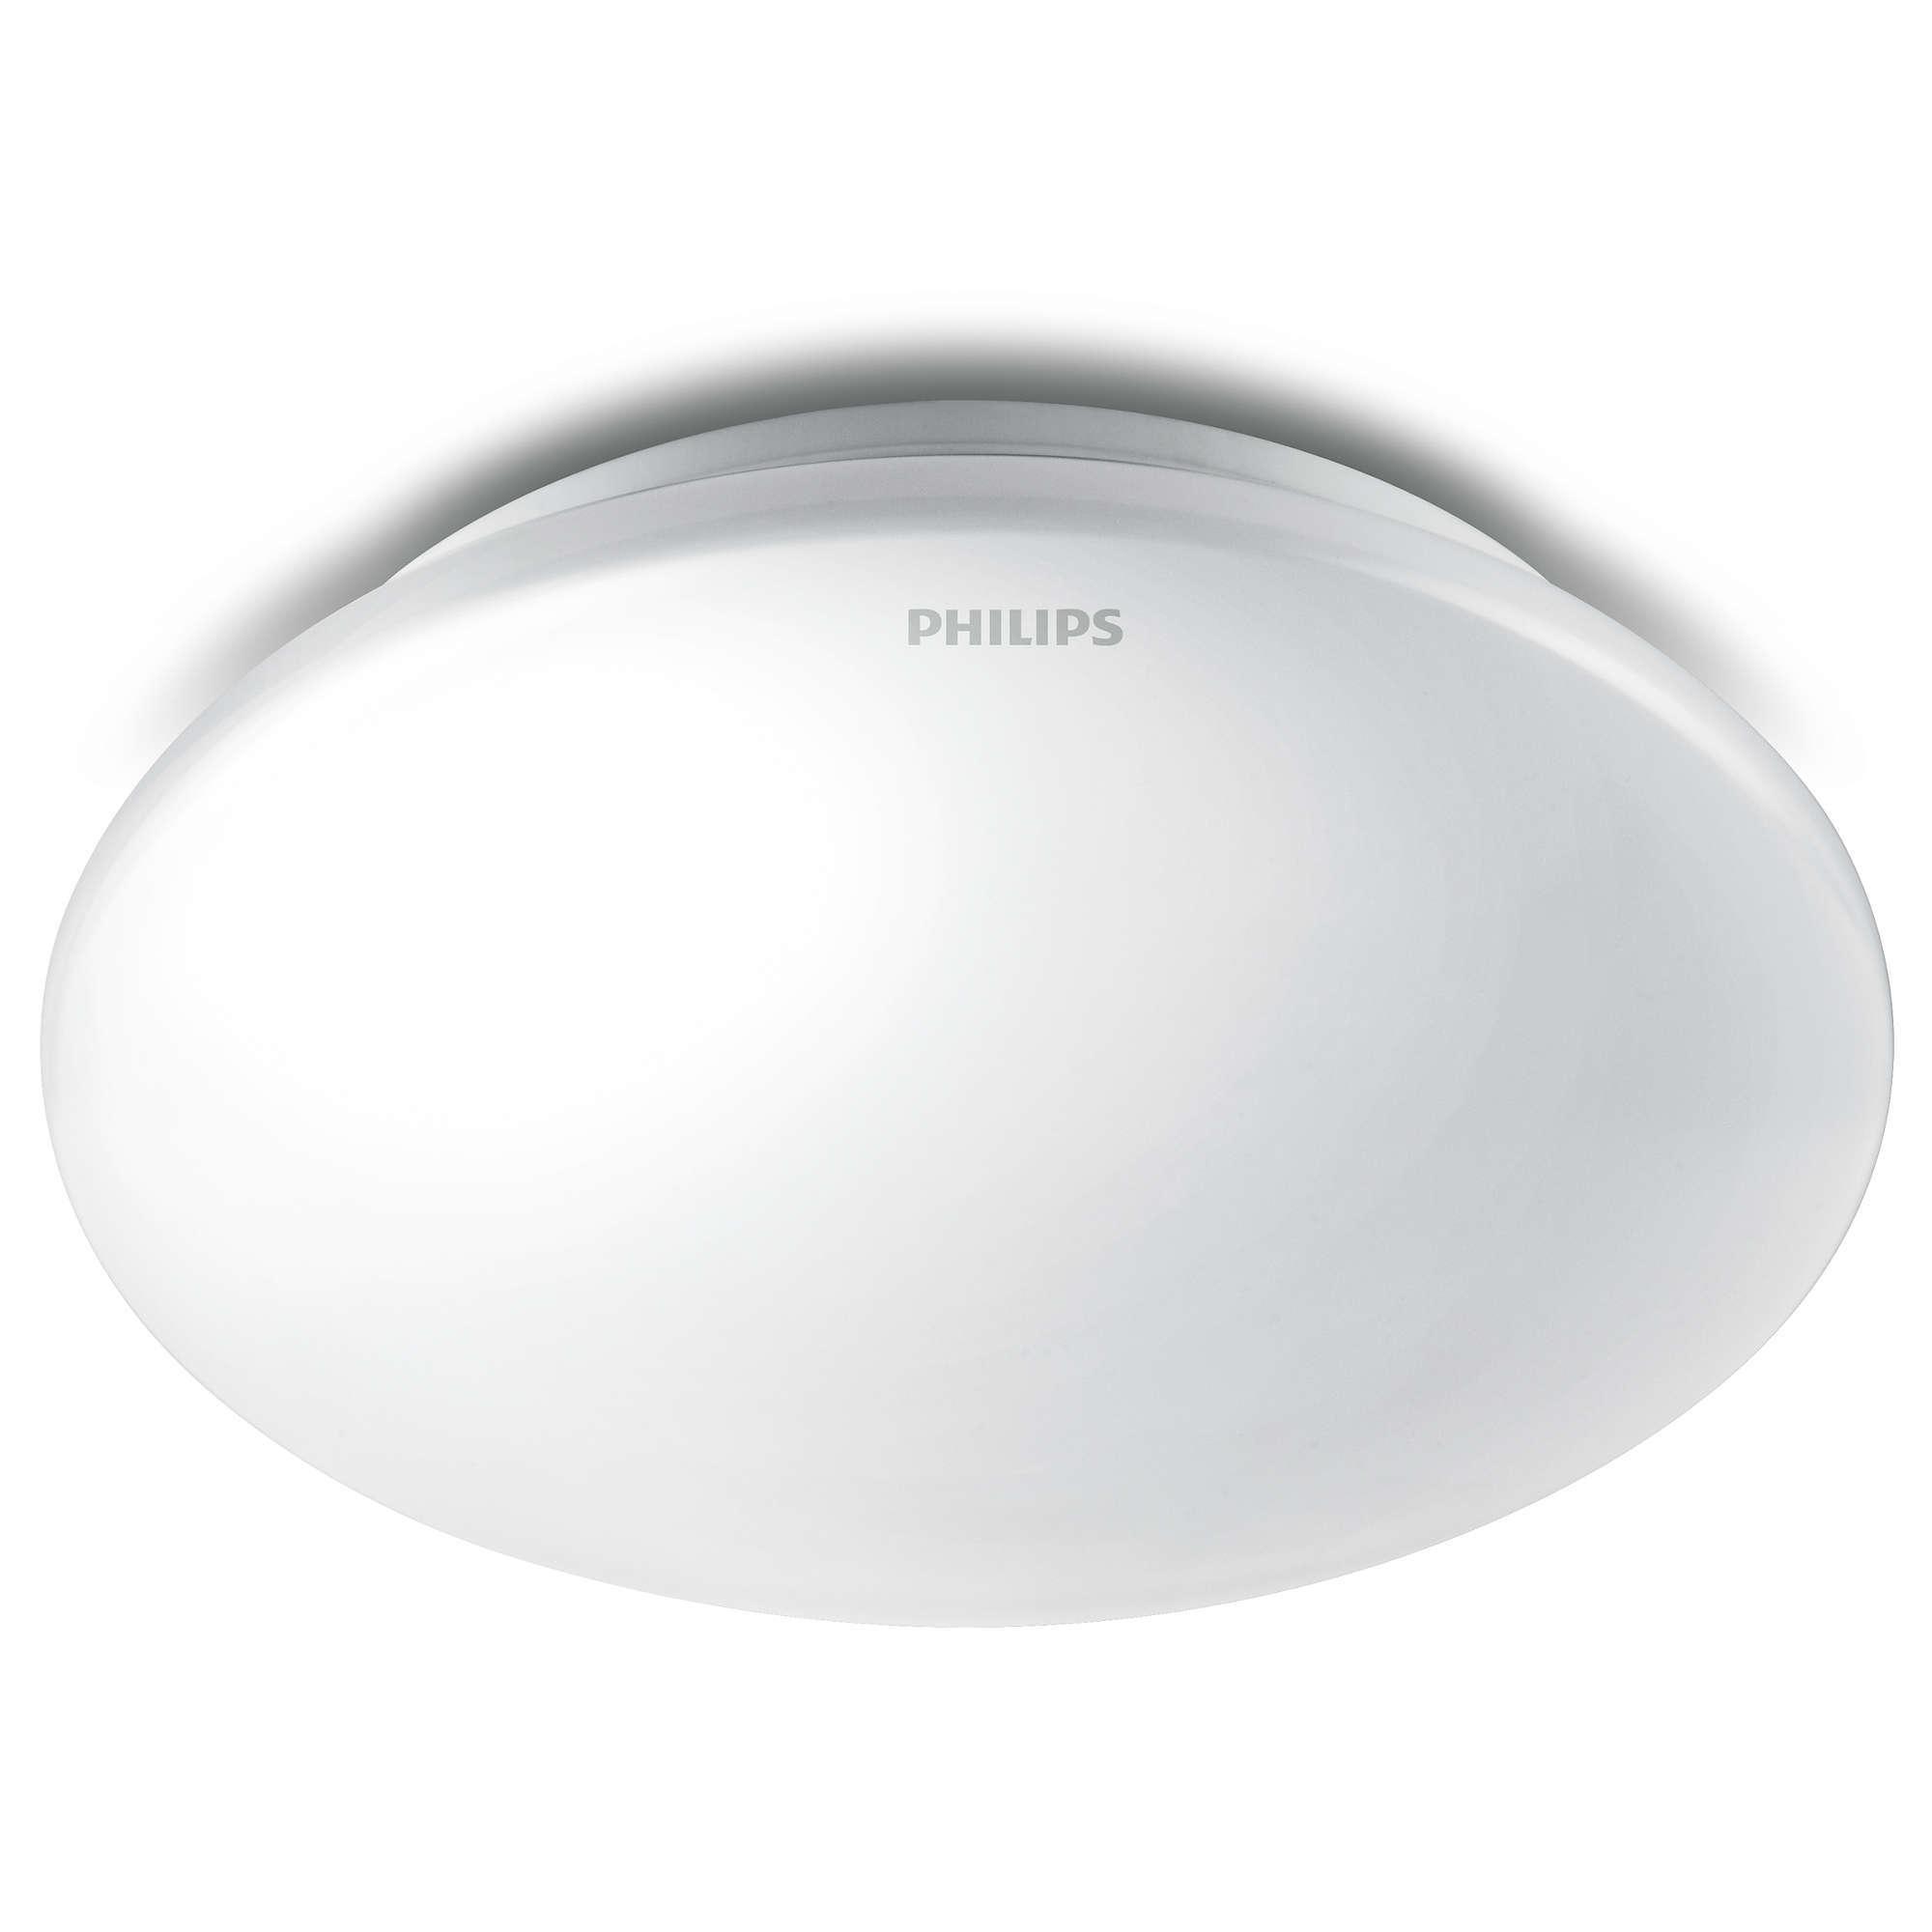 Philips Ceiling Led 33369 10watt 6500k Cahaya Putih Include Panel Nnp74667 18w Cool Daylight Square Jual 10w Lampu Bundar Bason Tokopedia